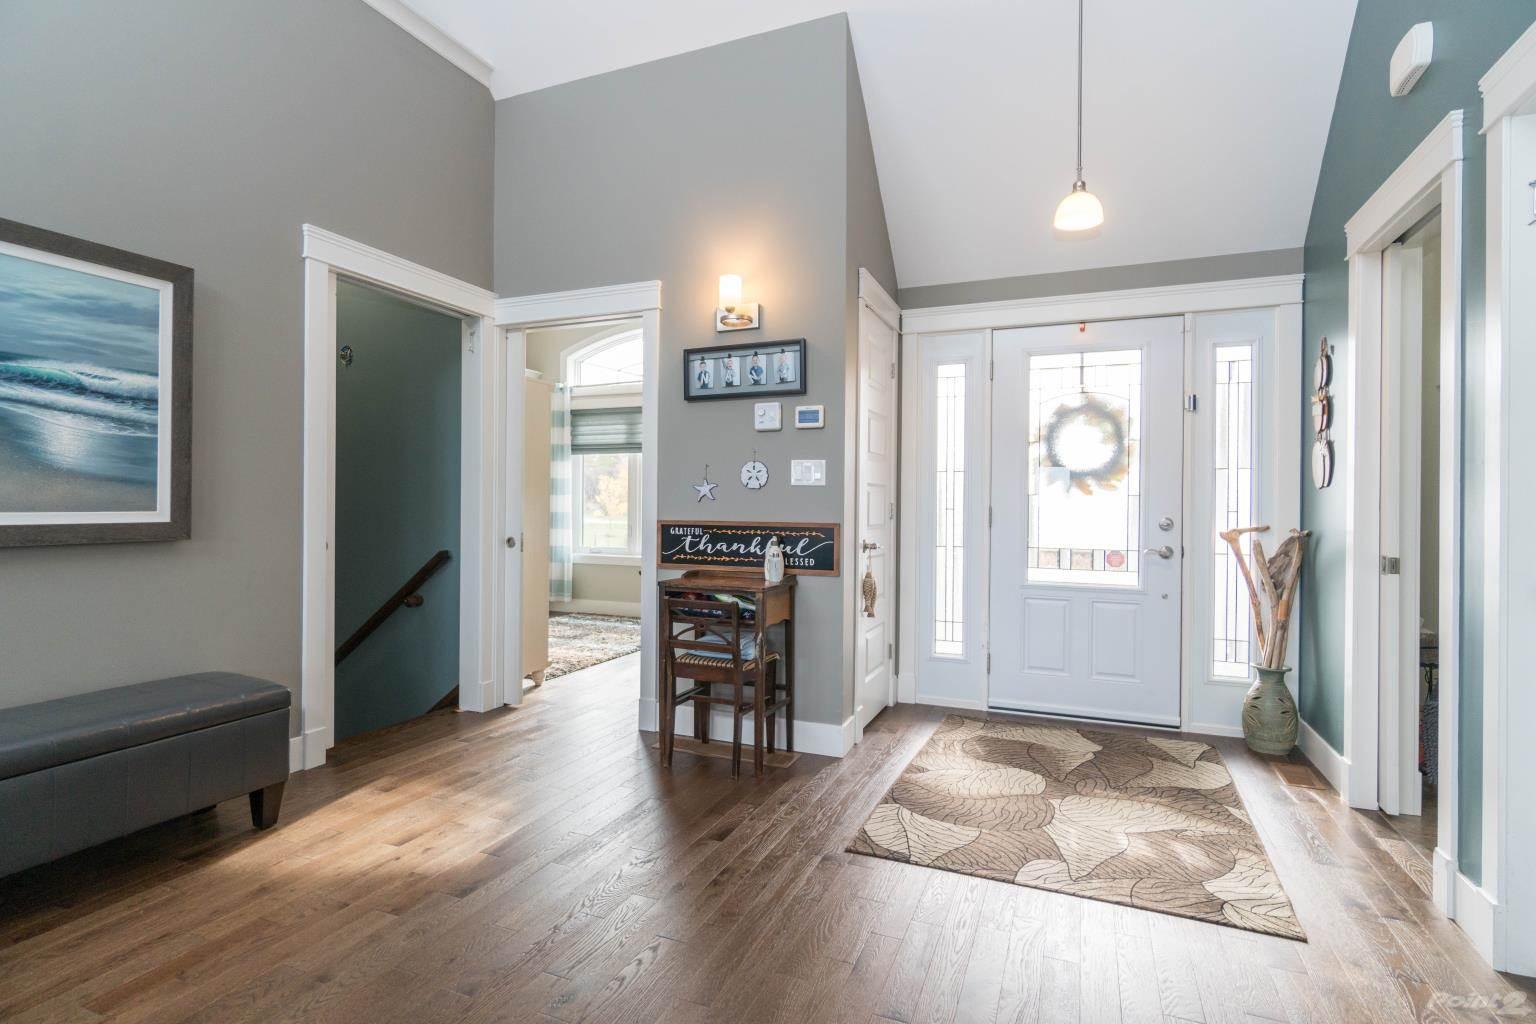 Donaldston Rd in Donaldston - House For Sale : MLS# null Photo 10